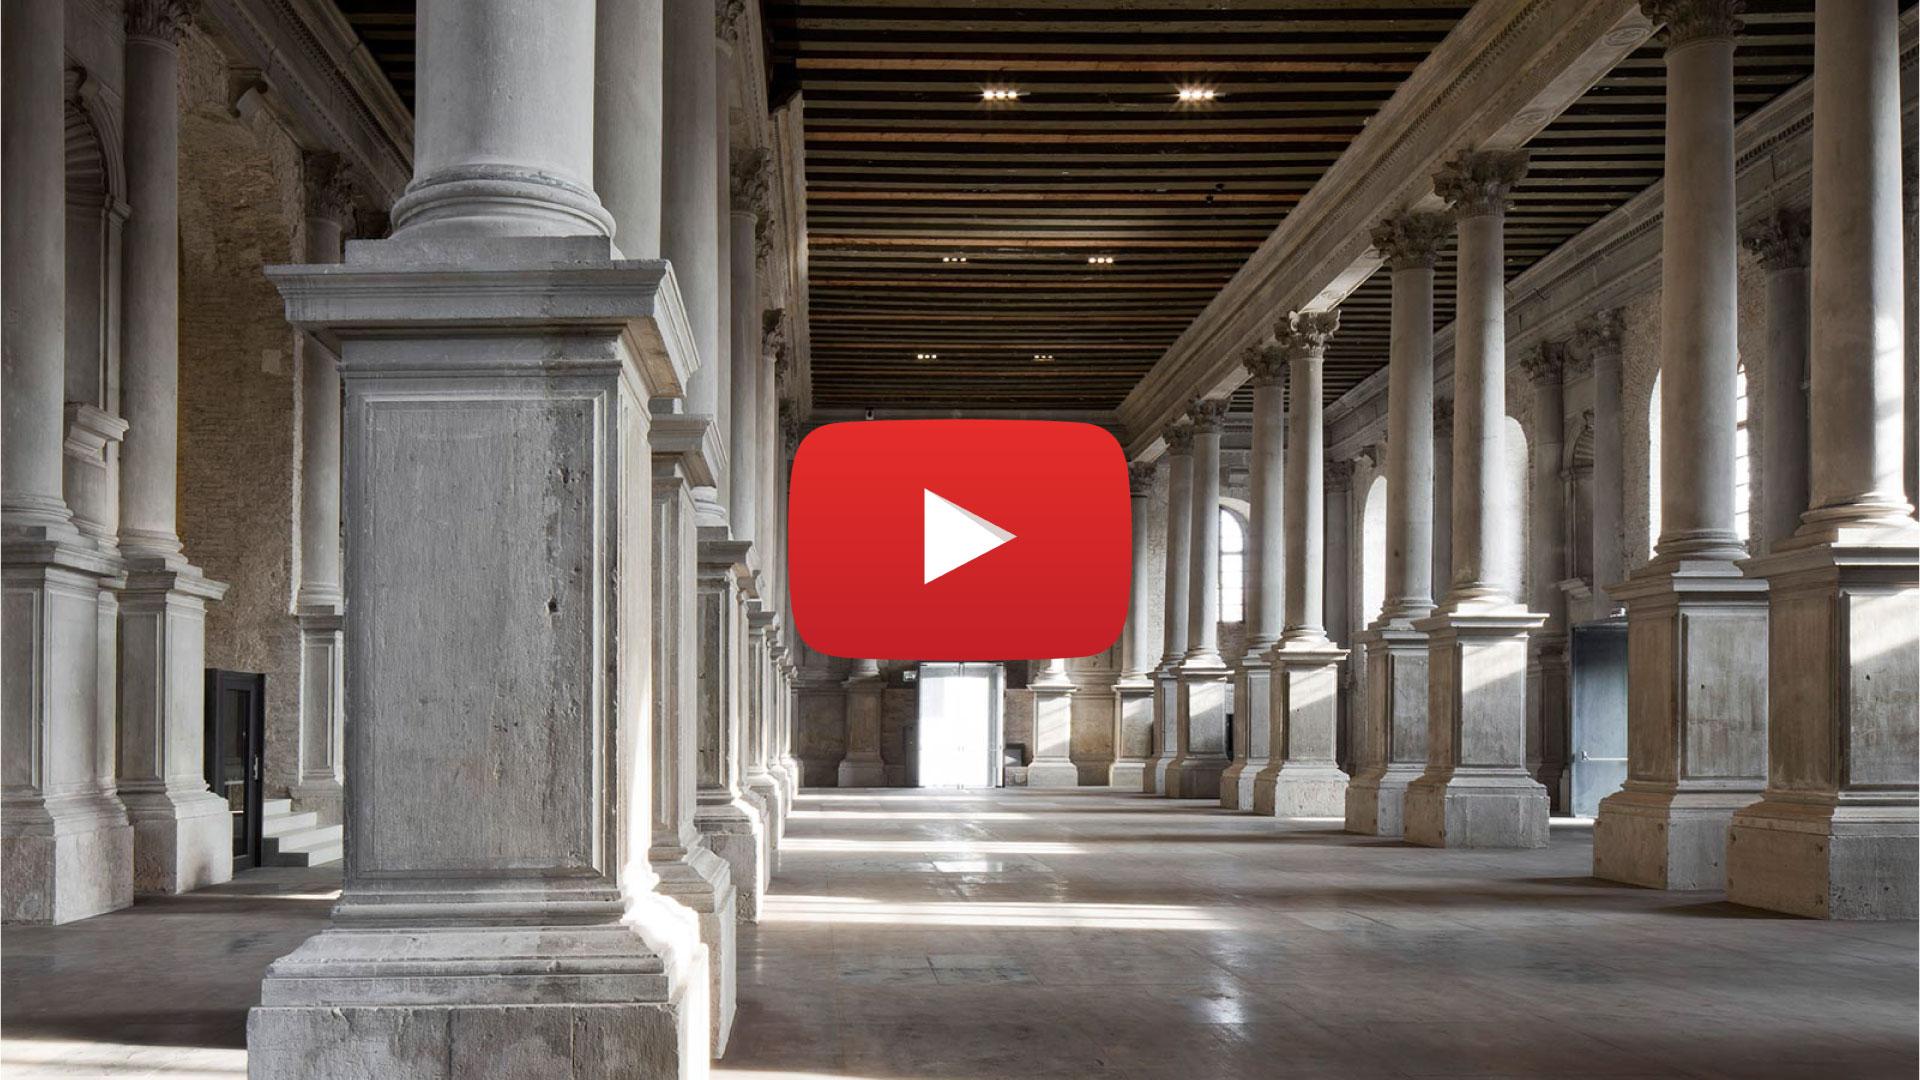 Umana, Lavorare a Venezia e Isole